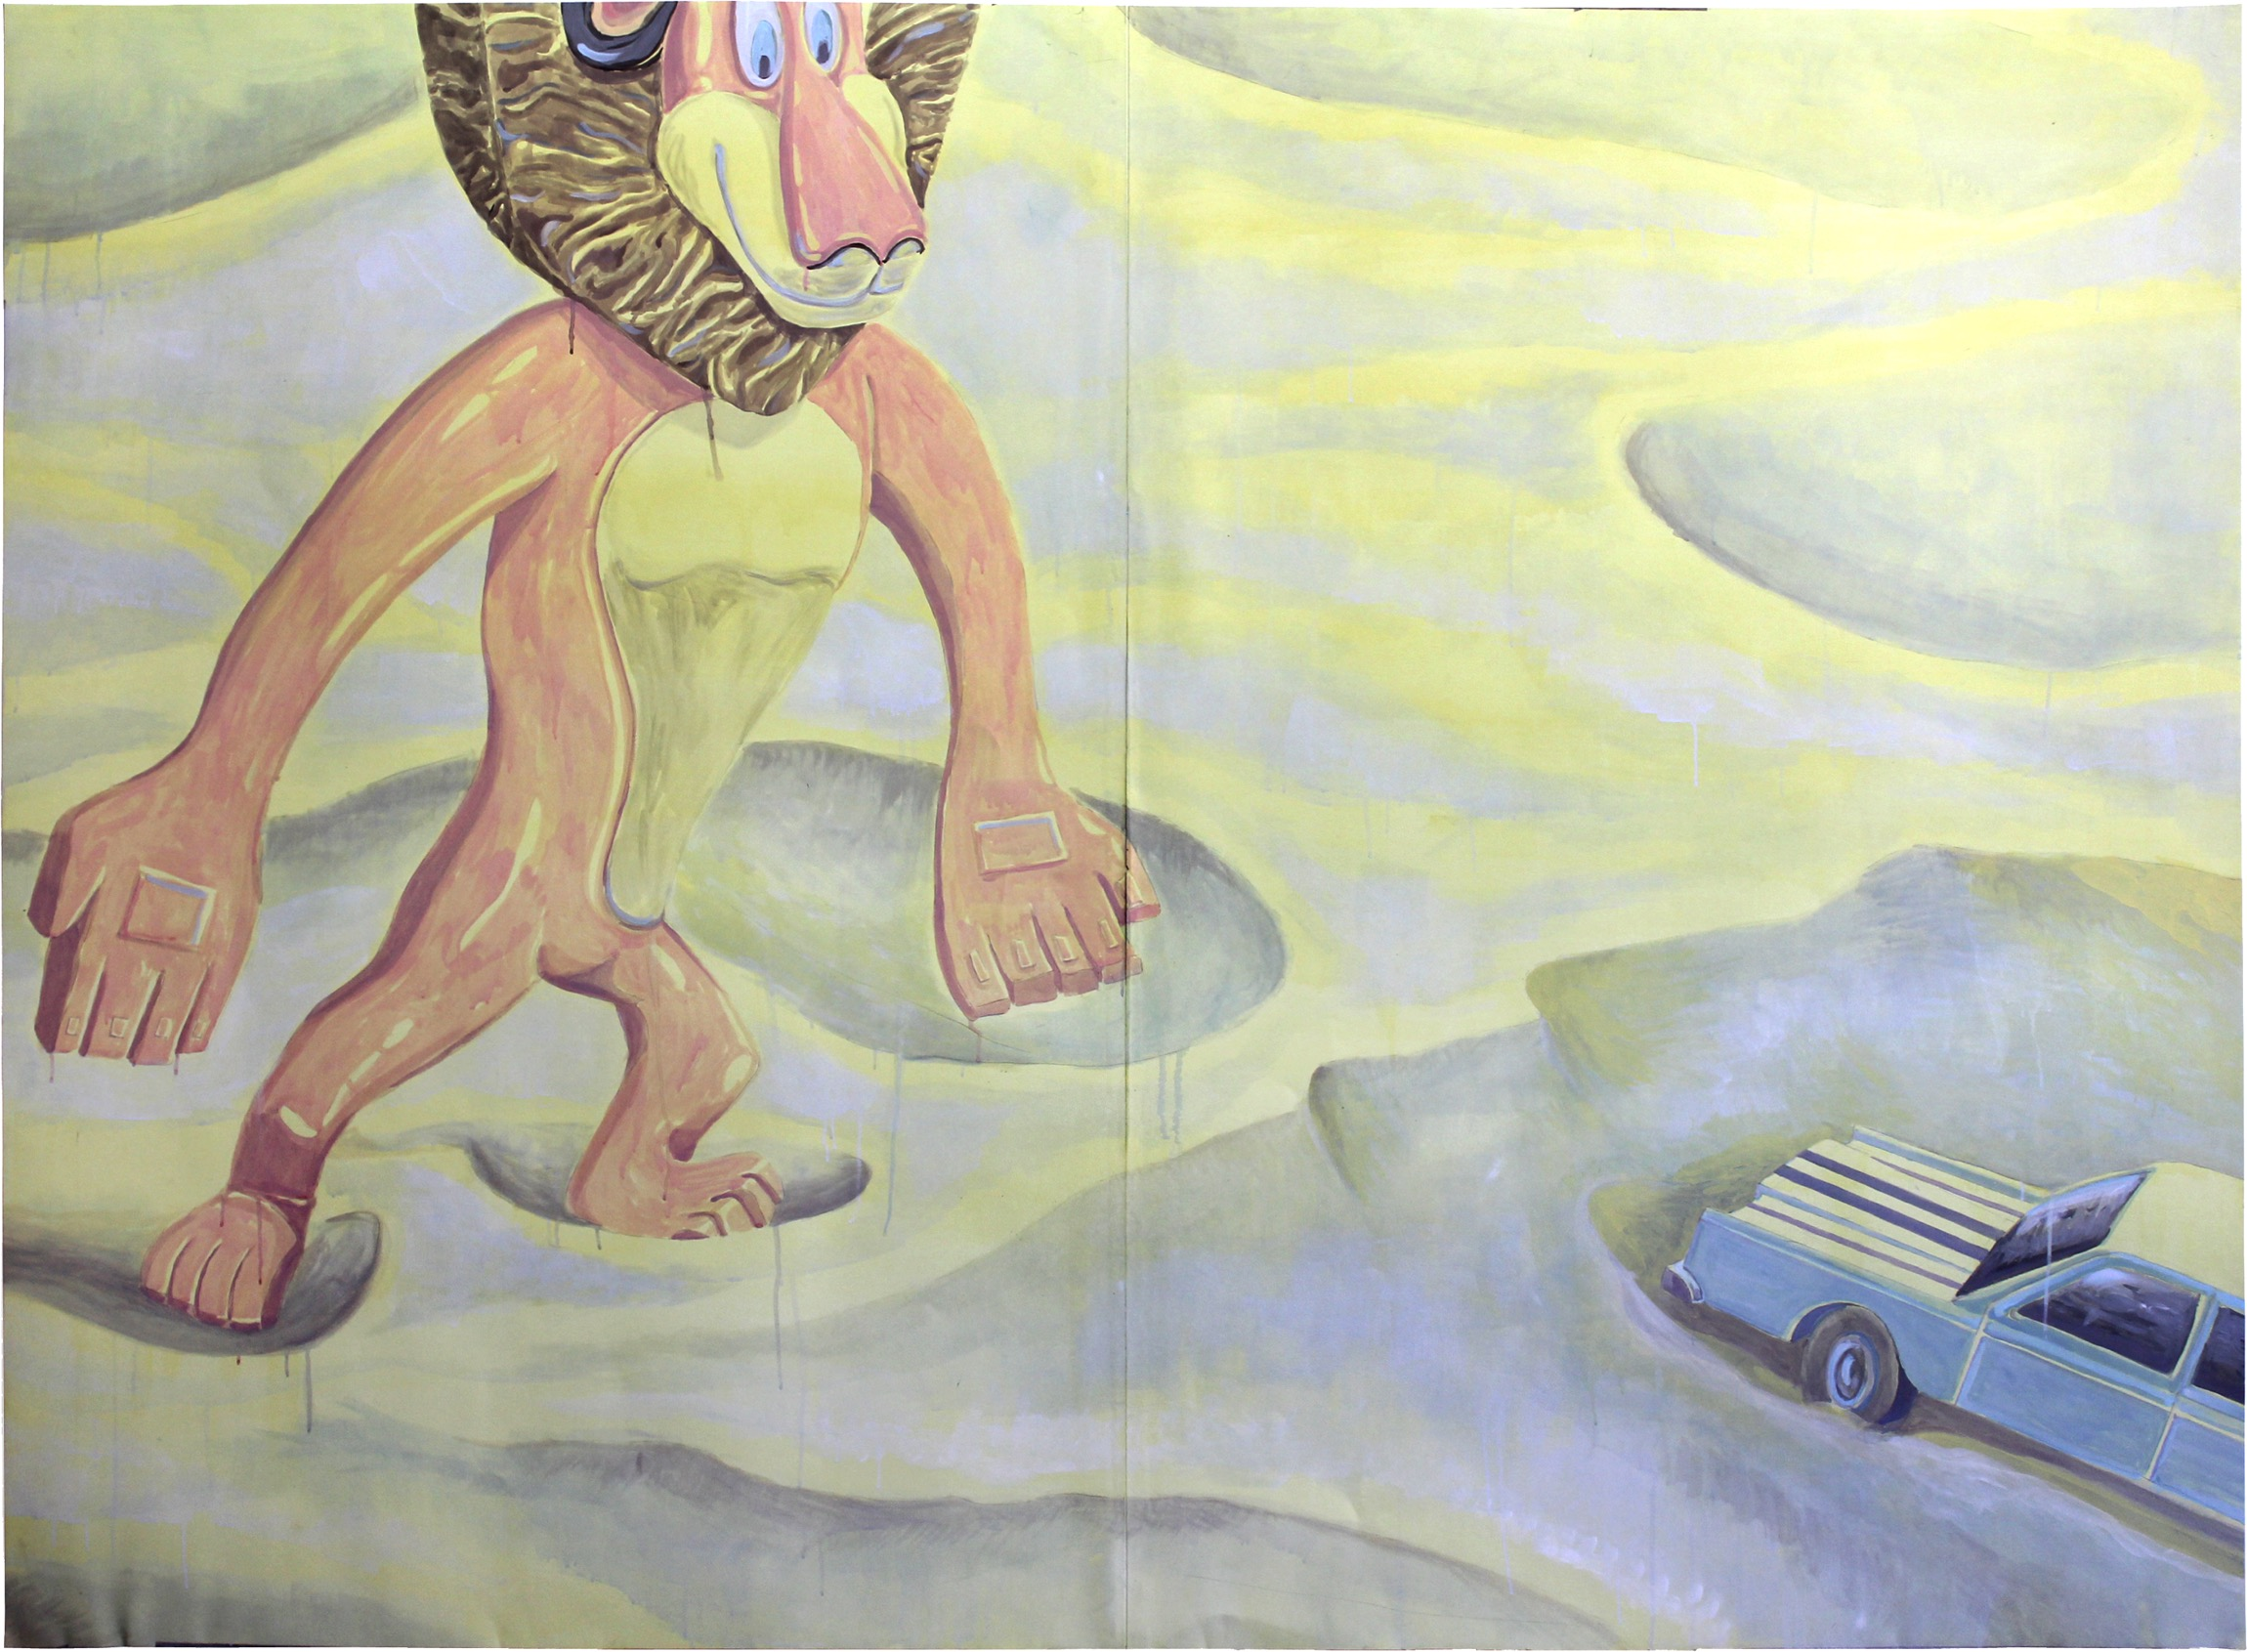 2012 Edouard Baribeaud Hic sunt leones